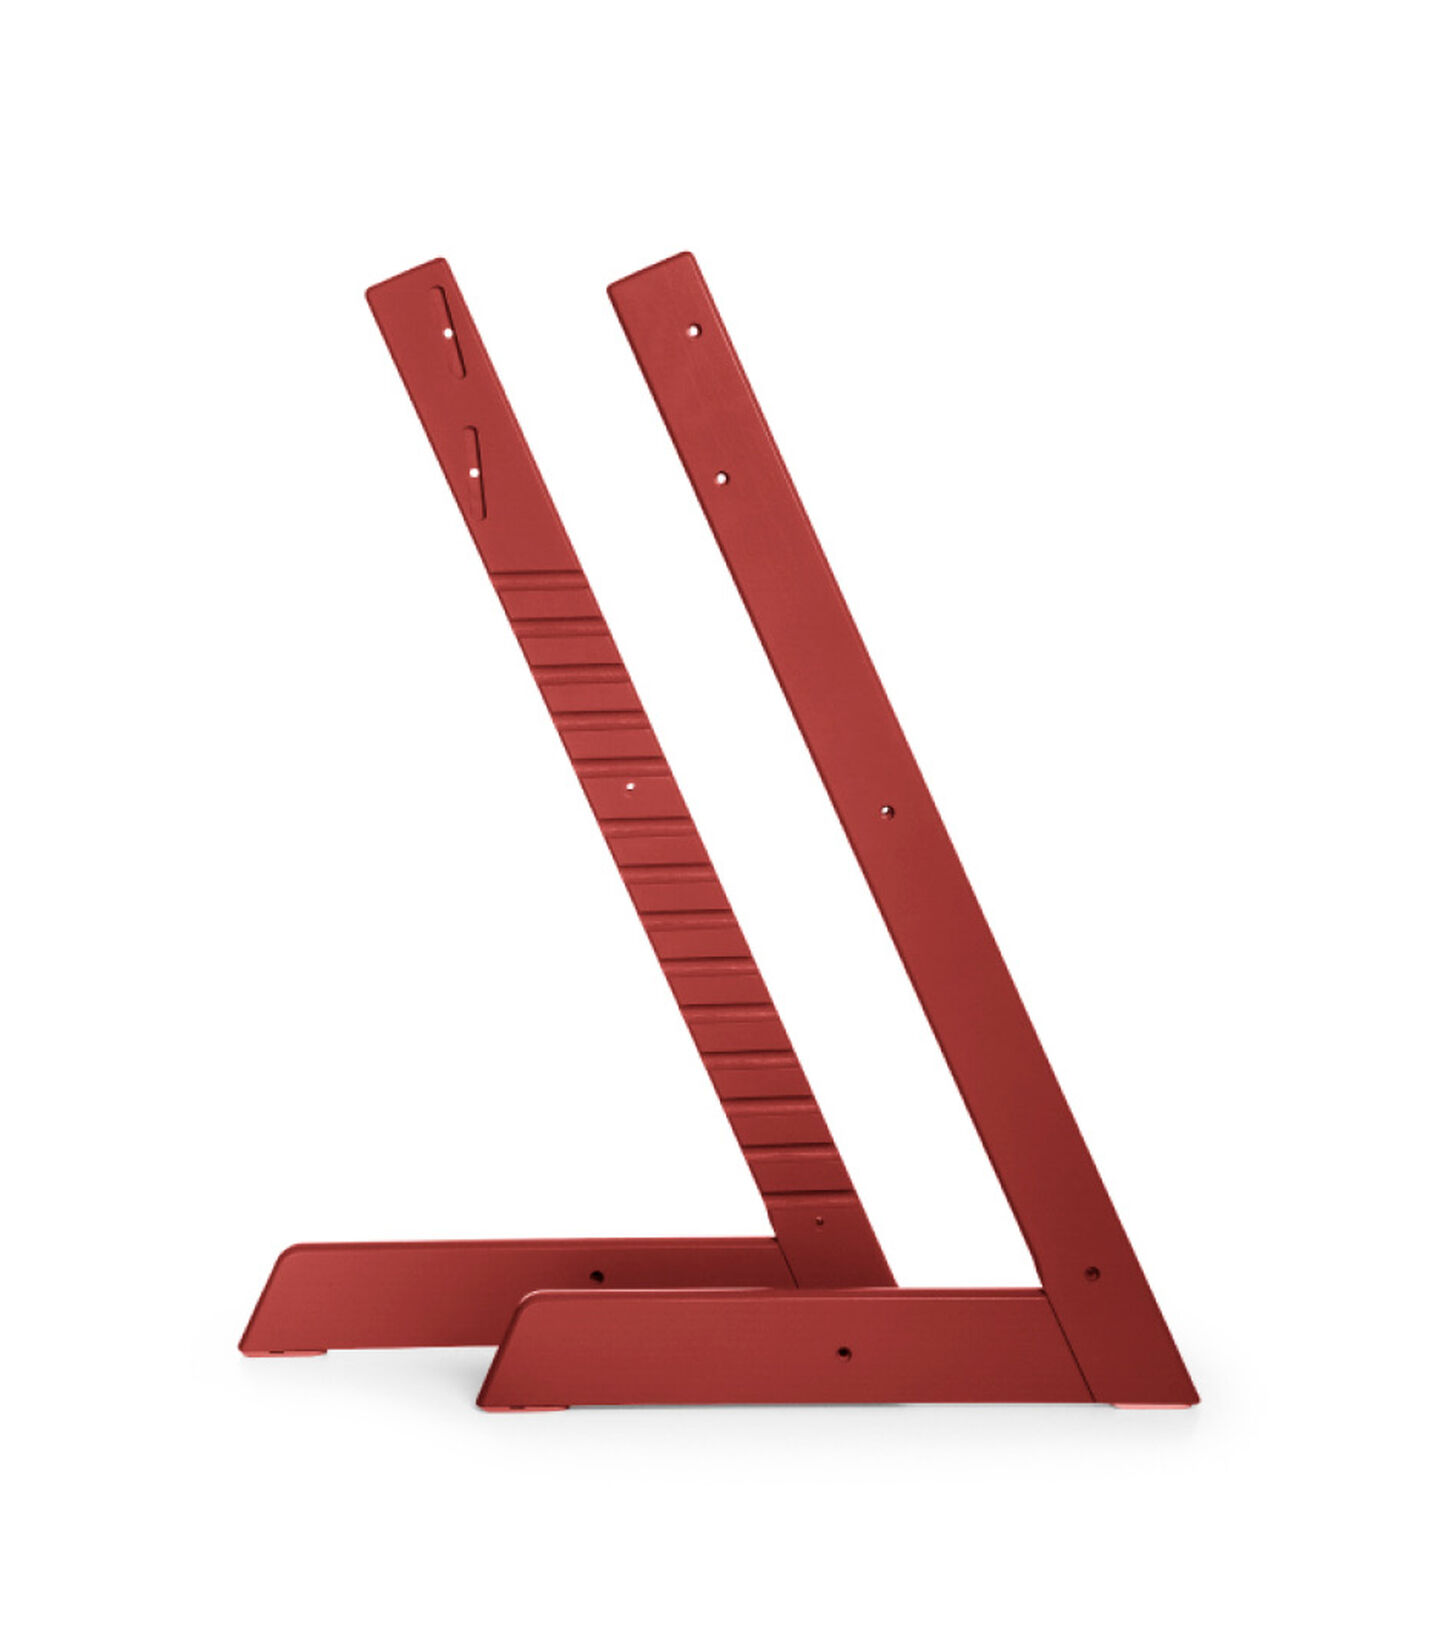 Tripp Trapp® Zijkant Set Warm rood, Warm rood, mainview view 1